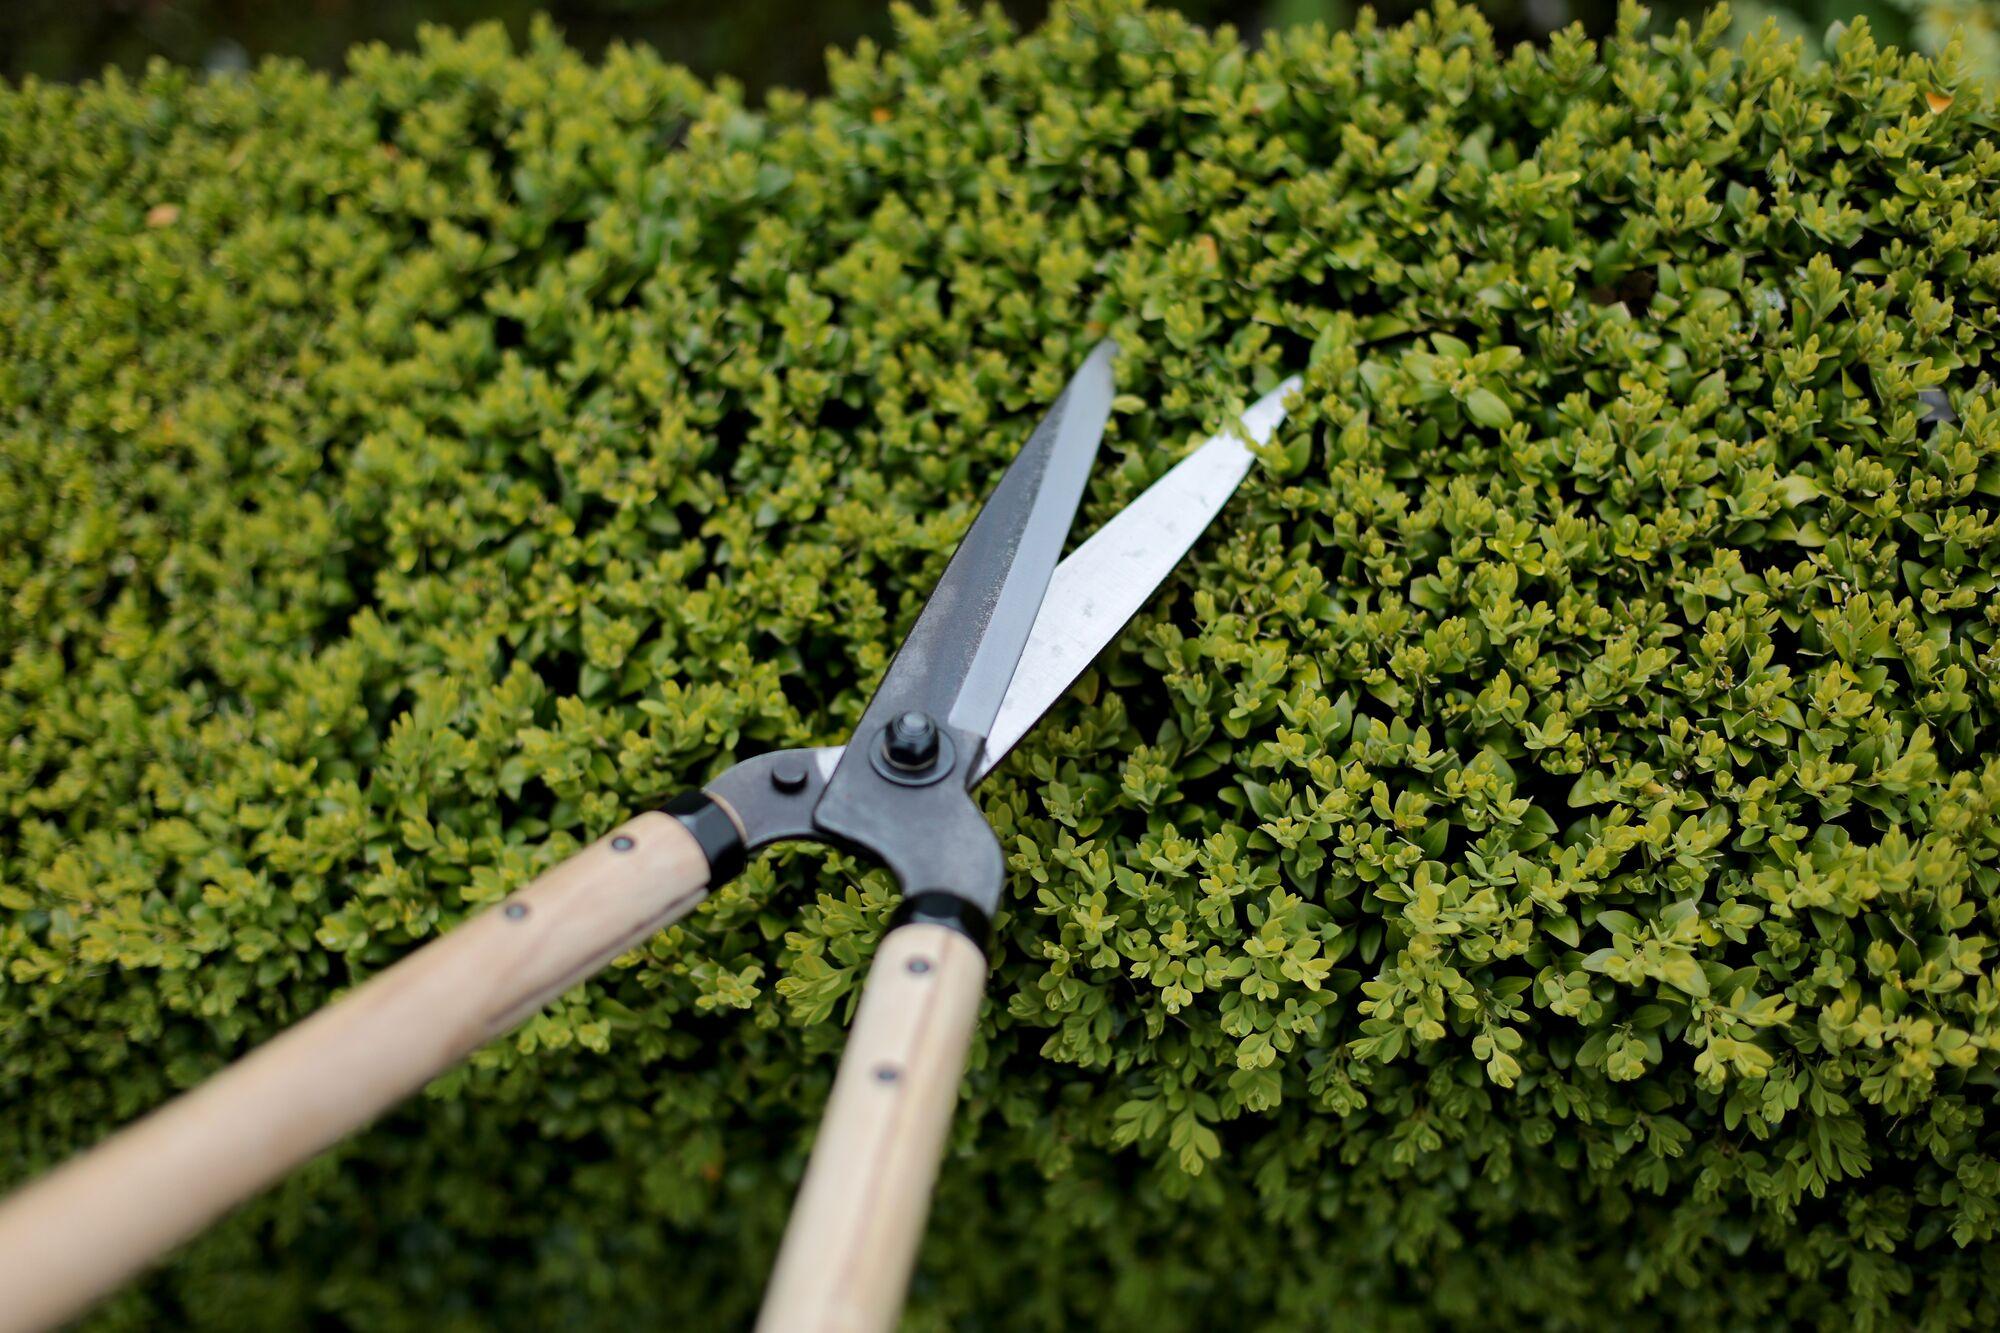 Niwaki Garden Shears With Heavy Duty Leather Sheath